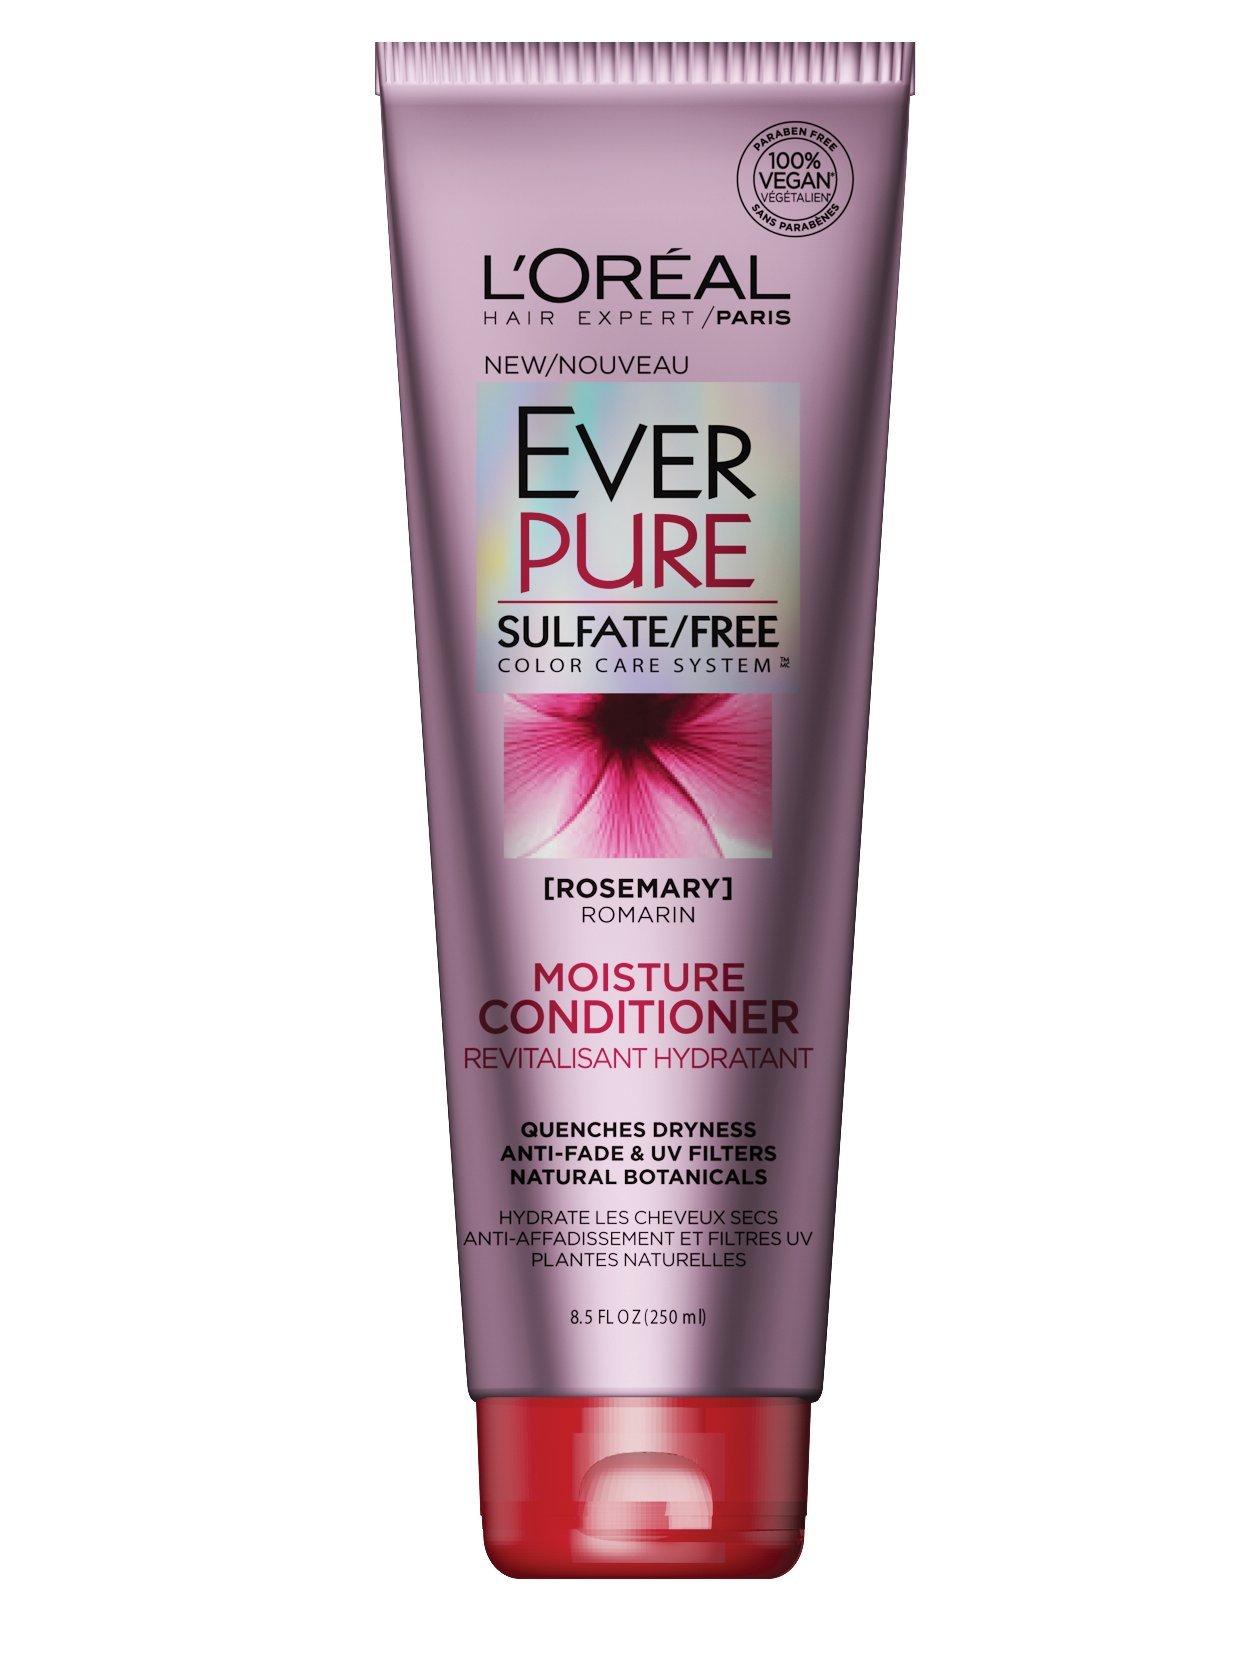 Save $4.00/2 EVER Shampoo, Conditioner or Treatment